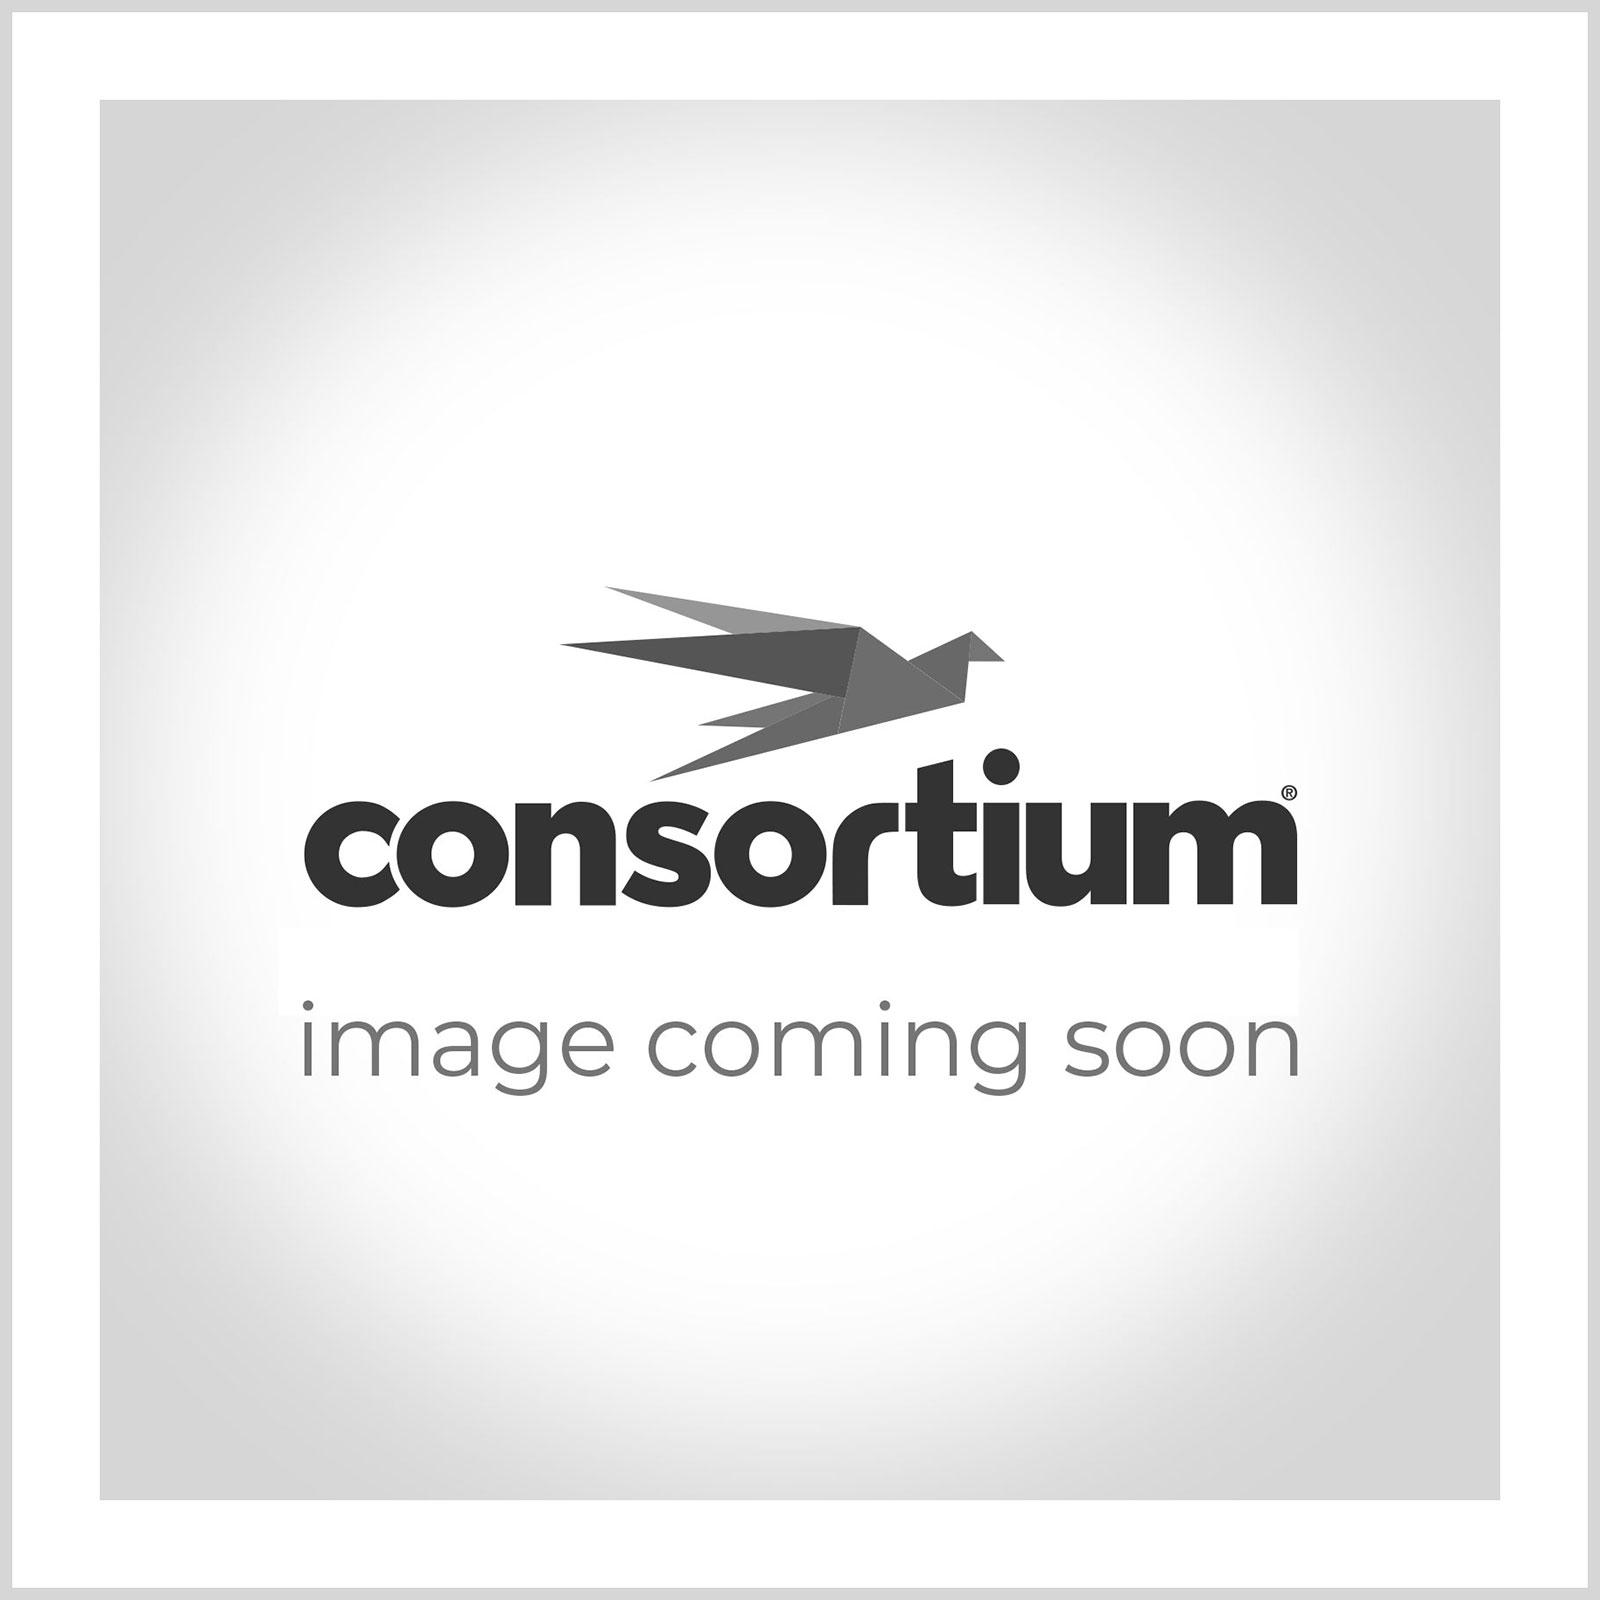 Consortium Mini Whiteboards